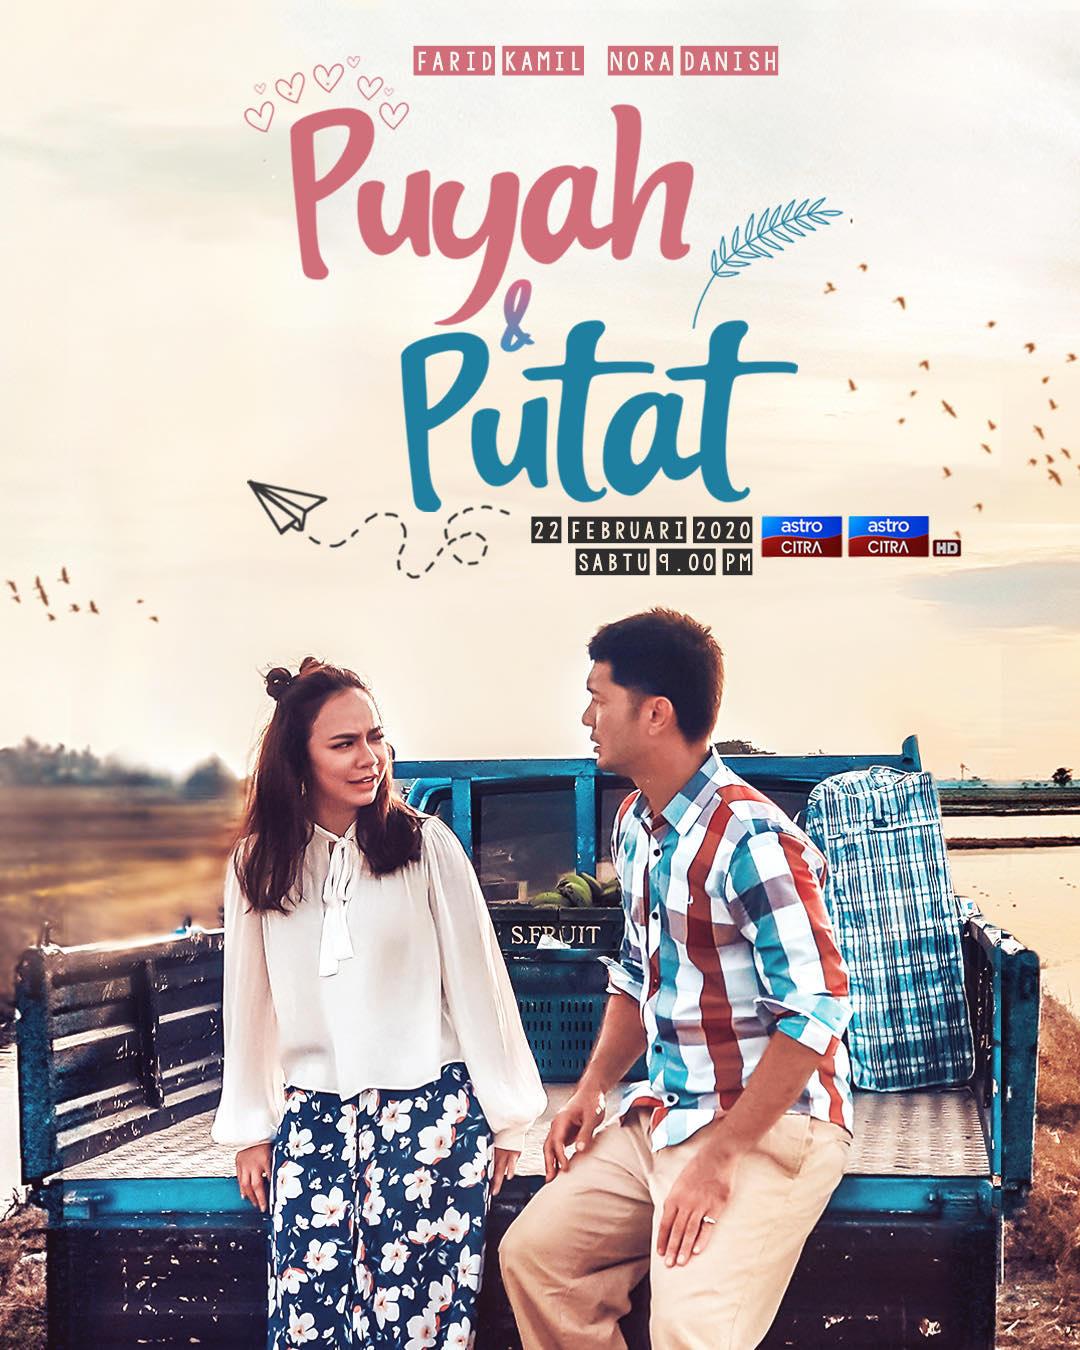 Puyah & Putat